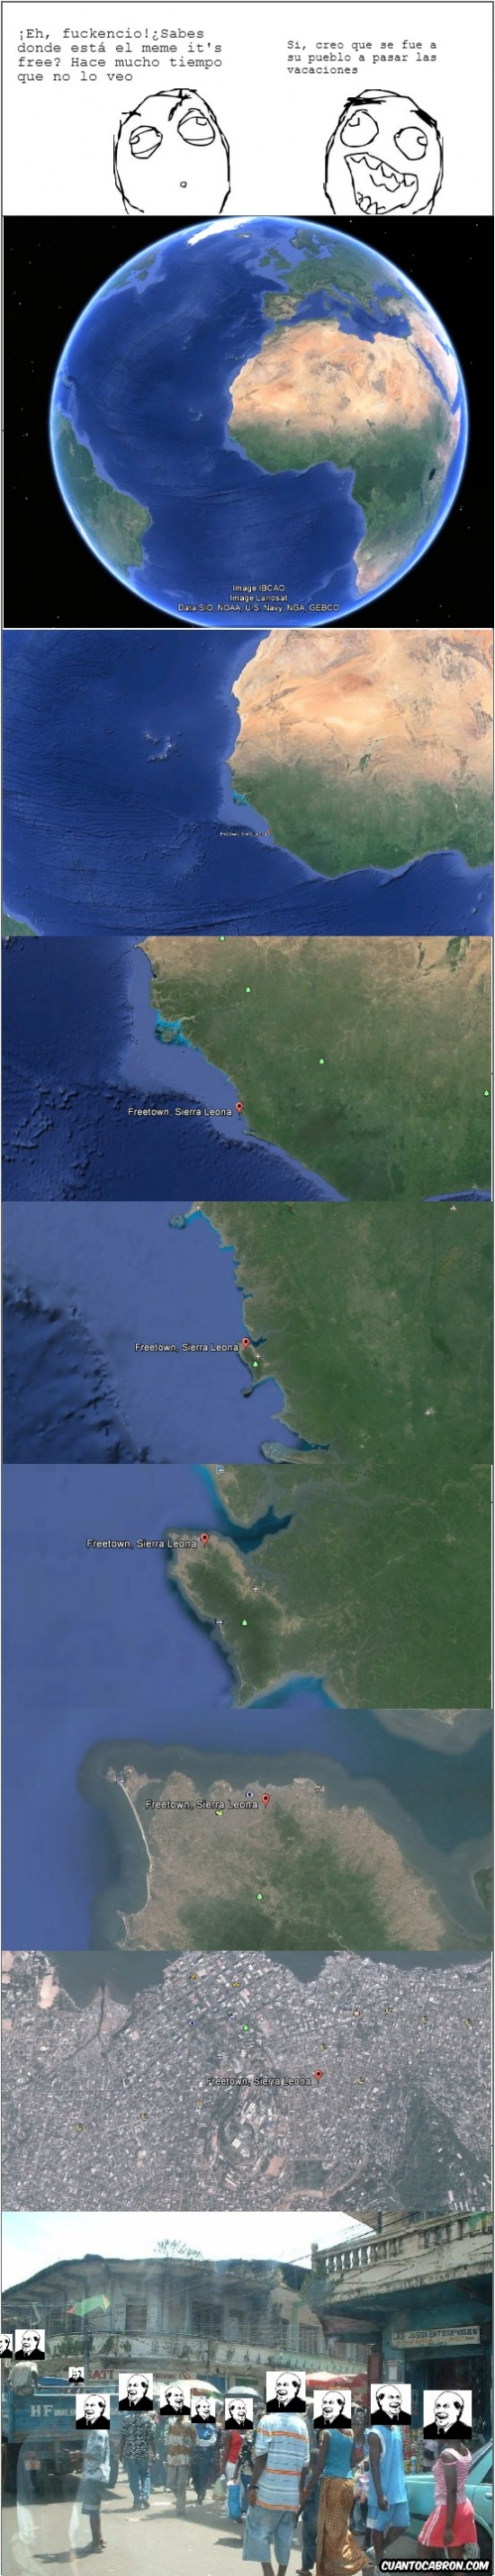 freetown,google earth,it's free,sierra leona,vacaciones